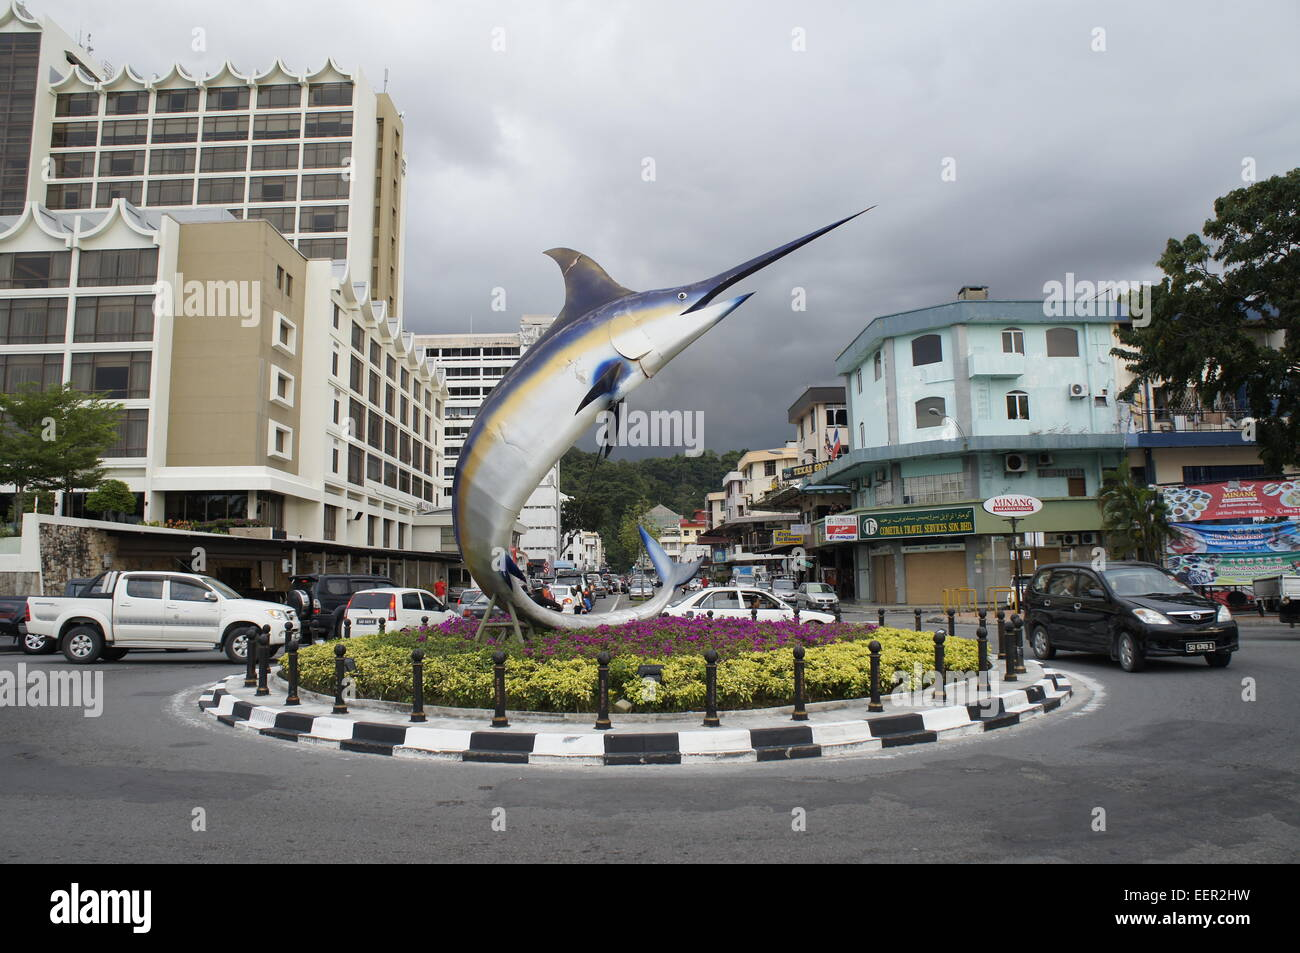 swordfish statue to commemorate Kota Kinabalu city status - Stock Image